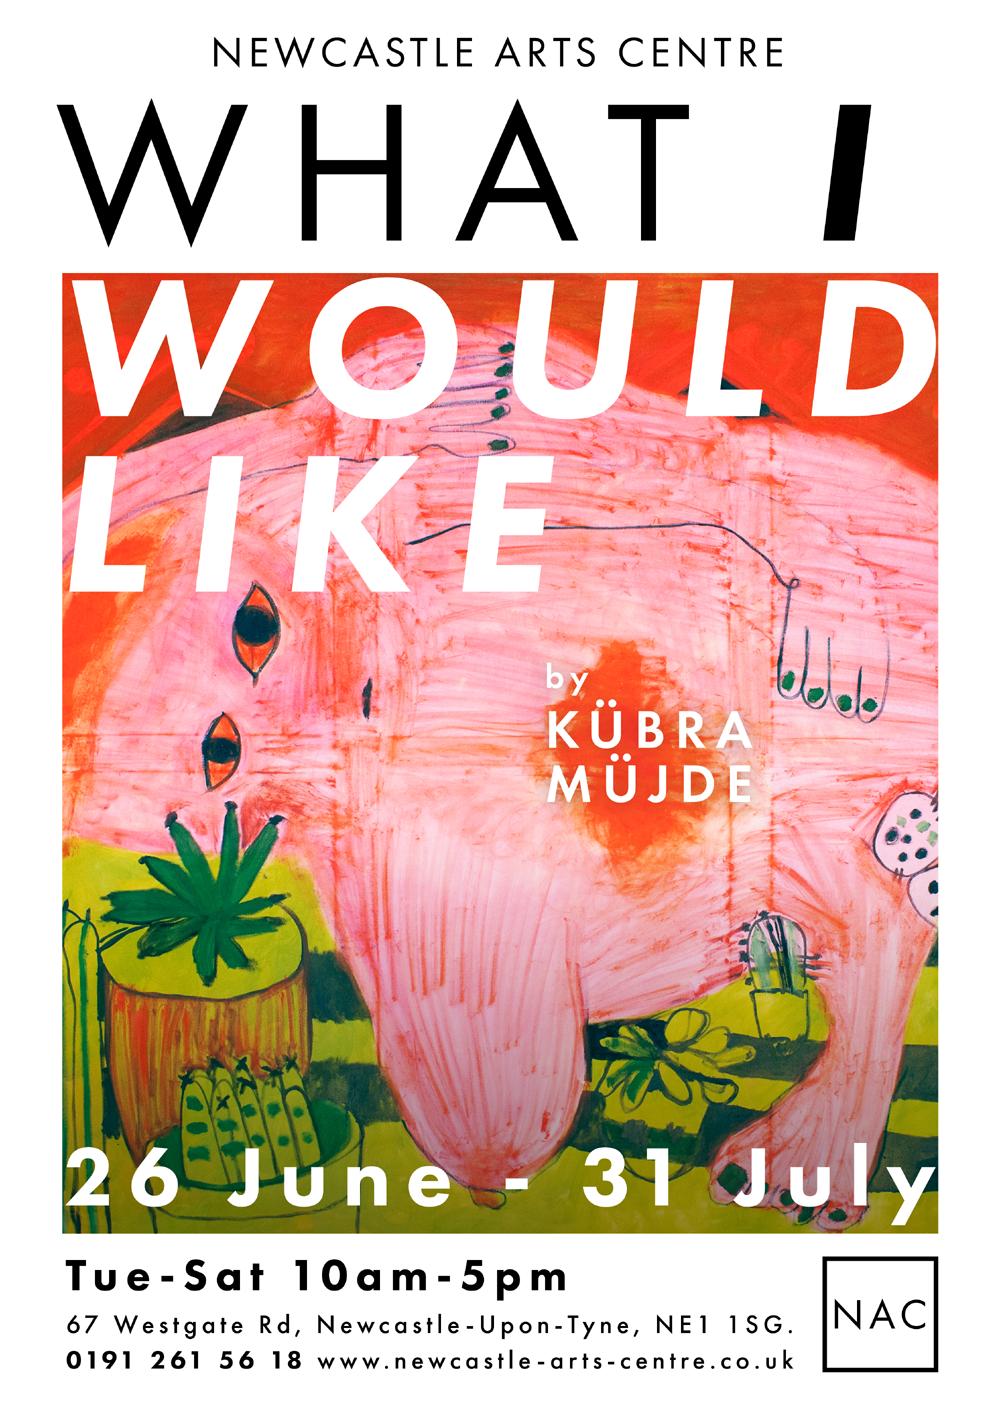 Kubra-Mujde-exhibition-Newcastle-Arts-Centre